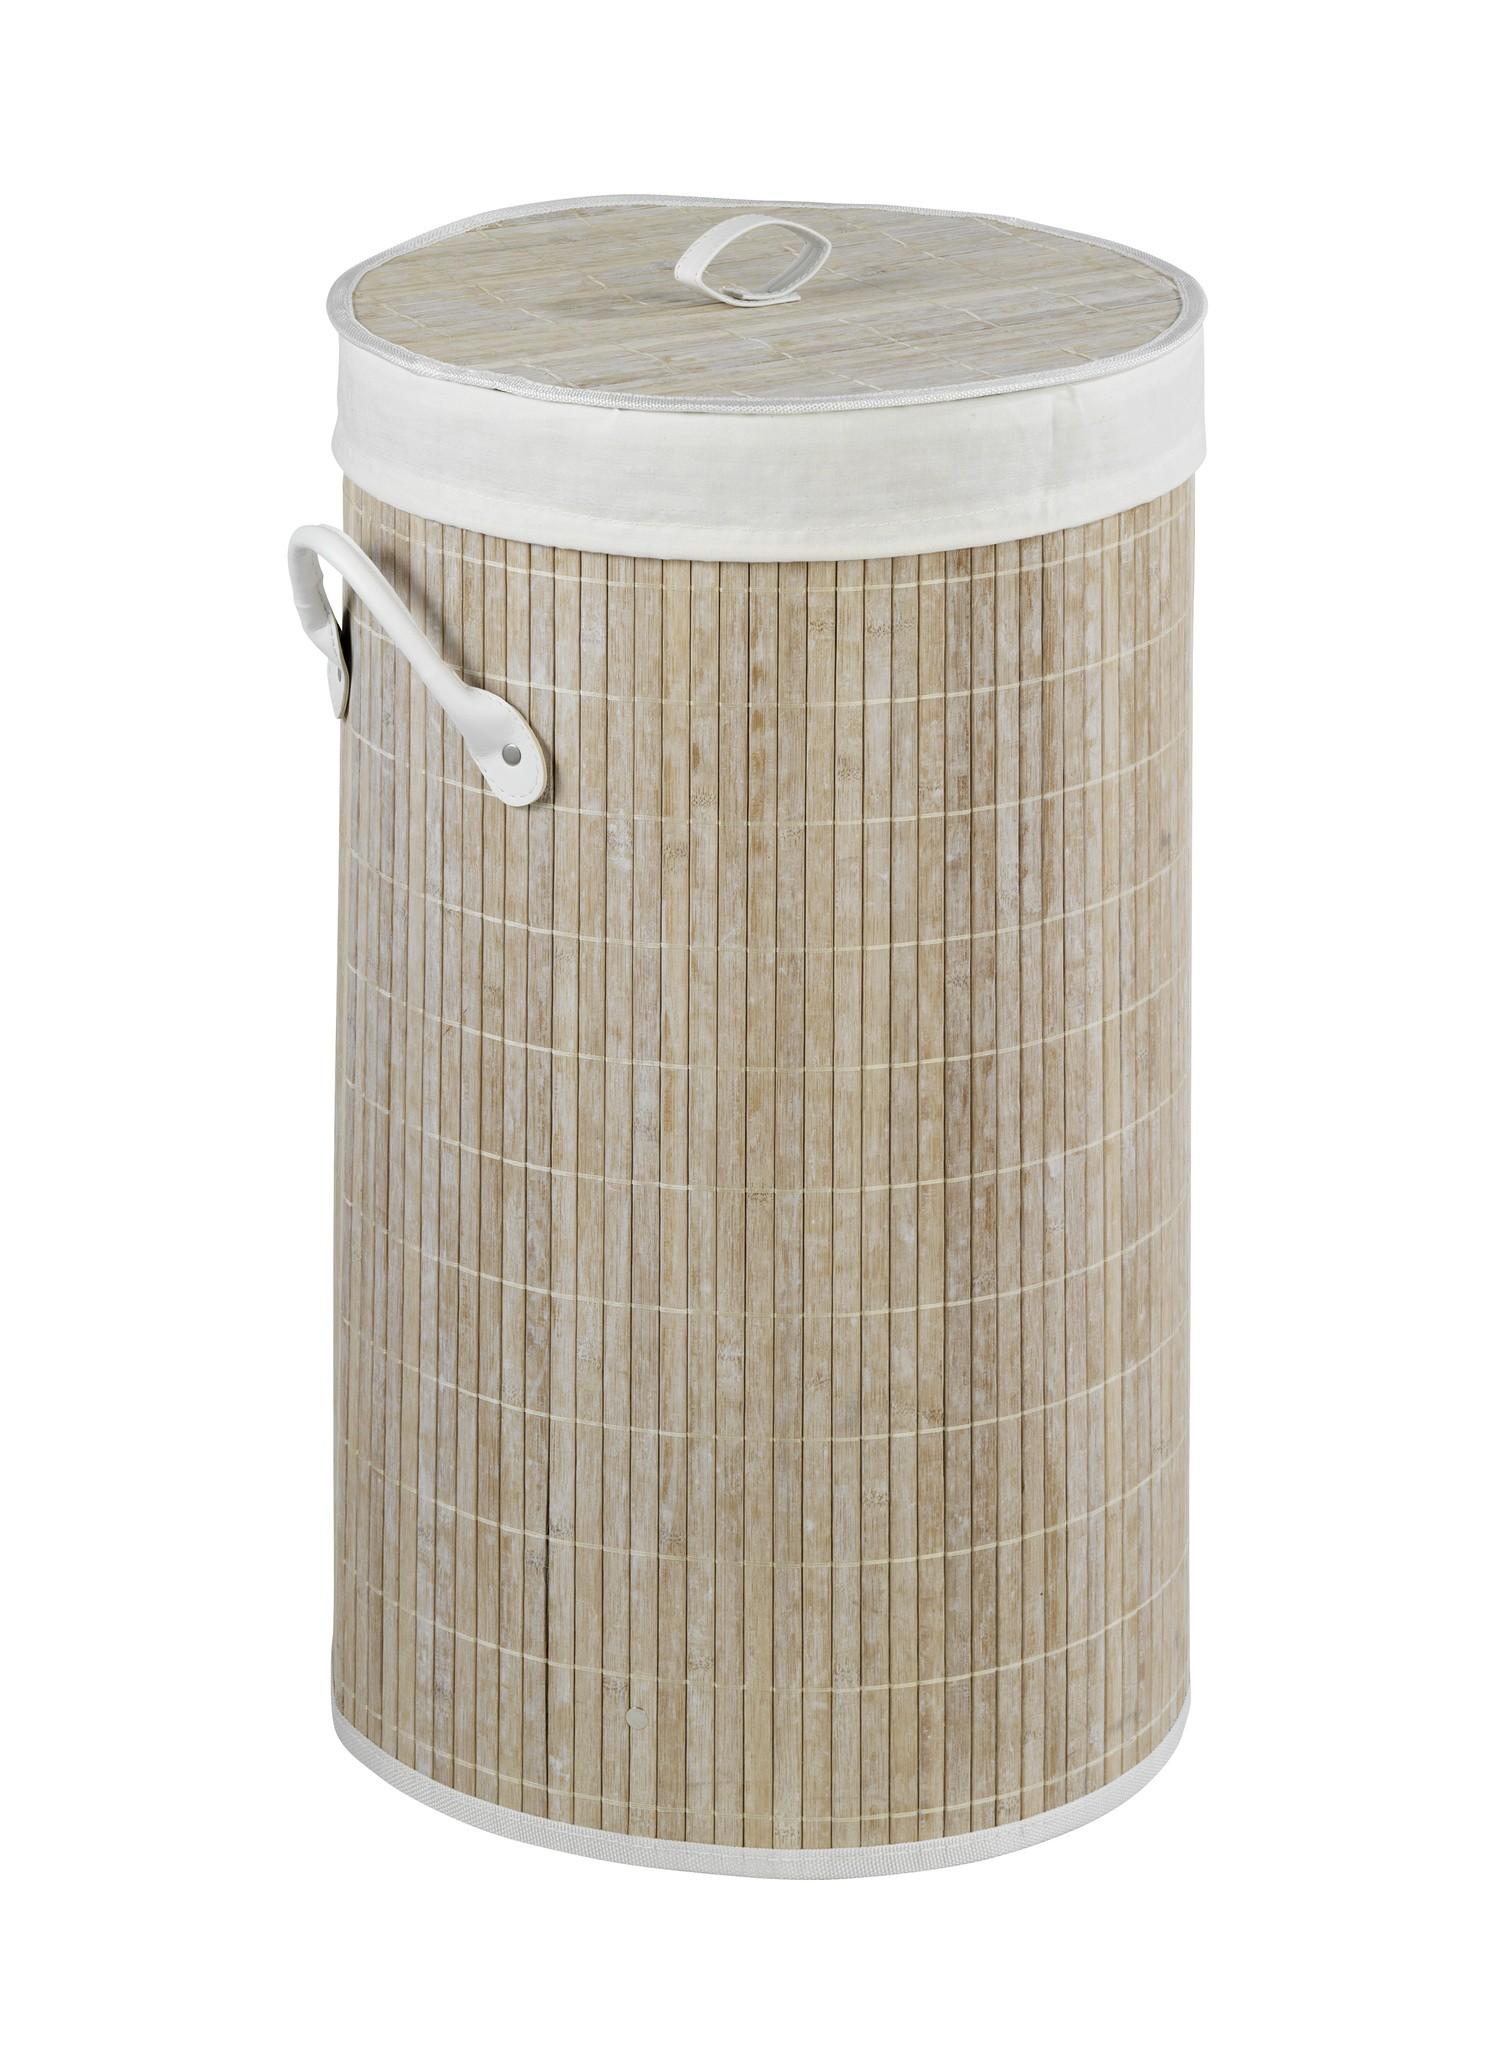 Wäschetruhe Bamboo Weiß, Wäschekorb, 55 l